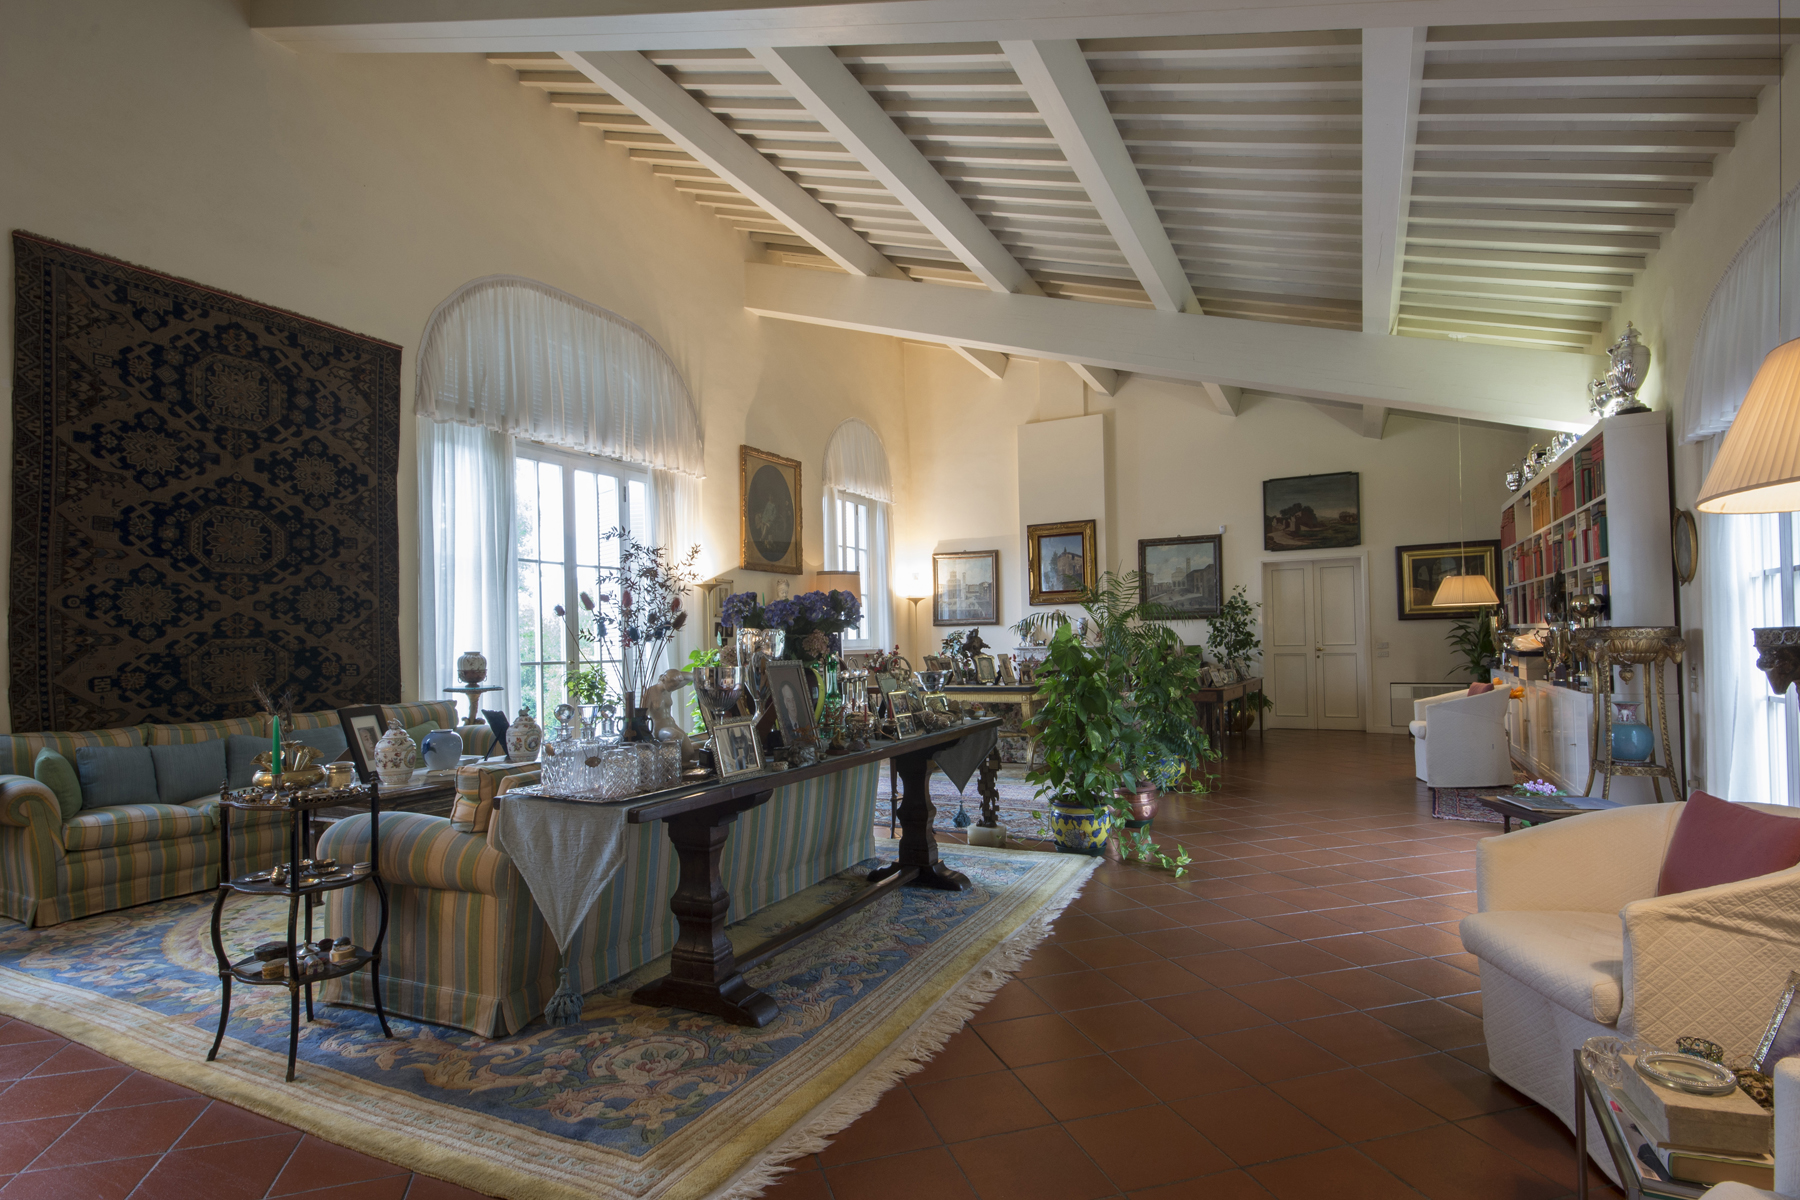 Villa in Vendita a Lucca: 5 locali, 2451 mq - Foto 9